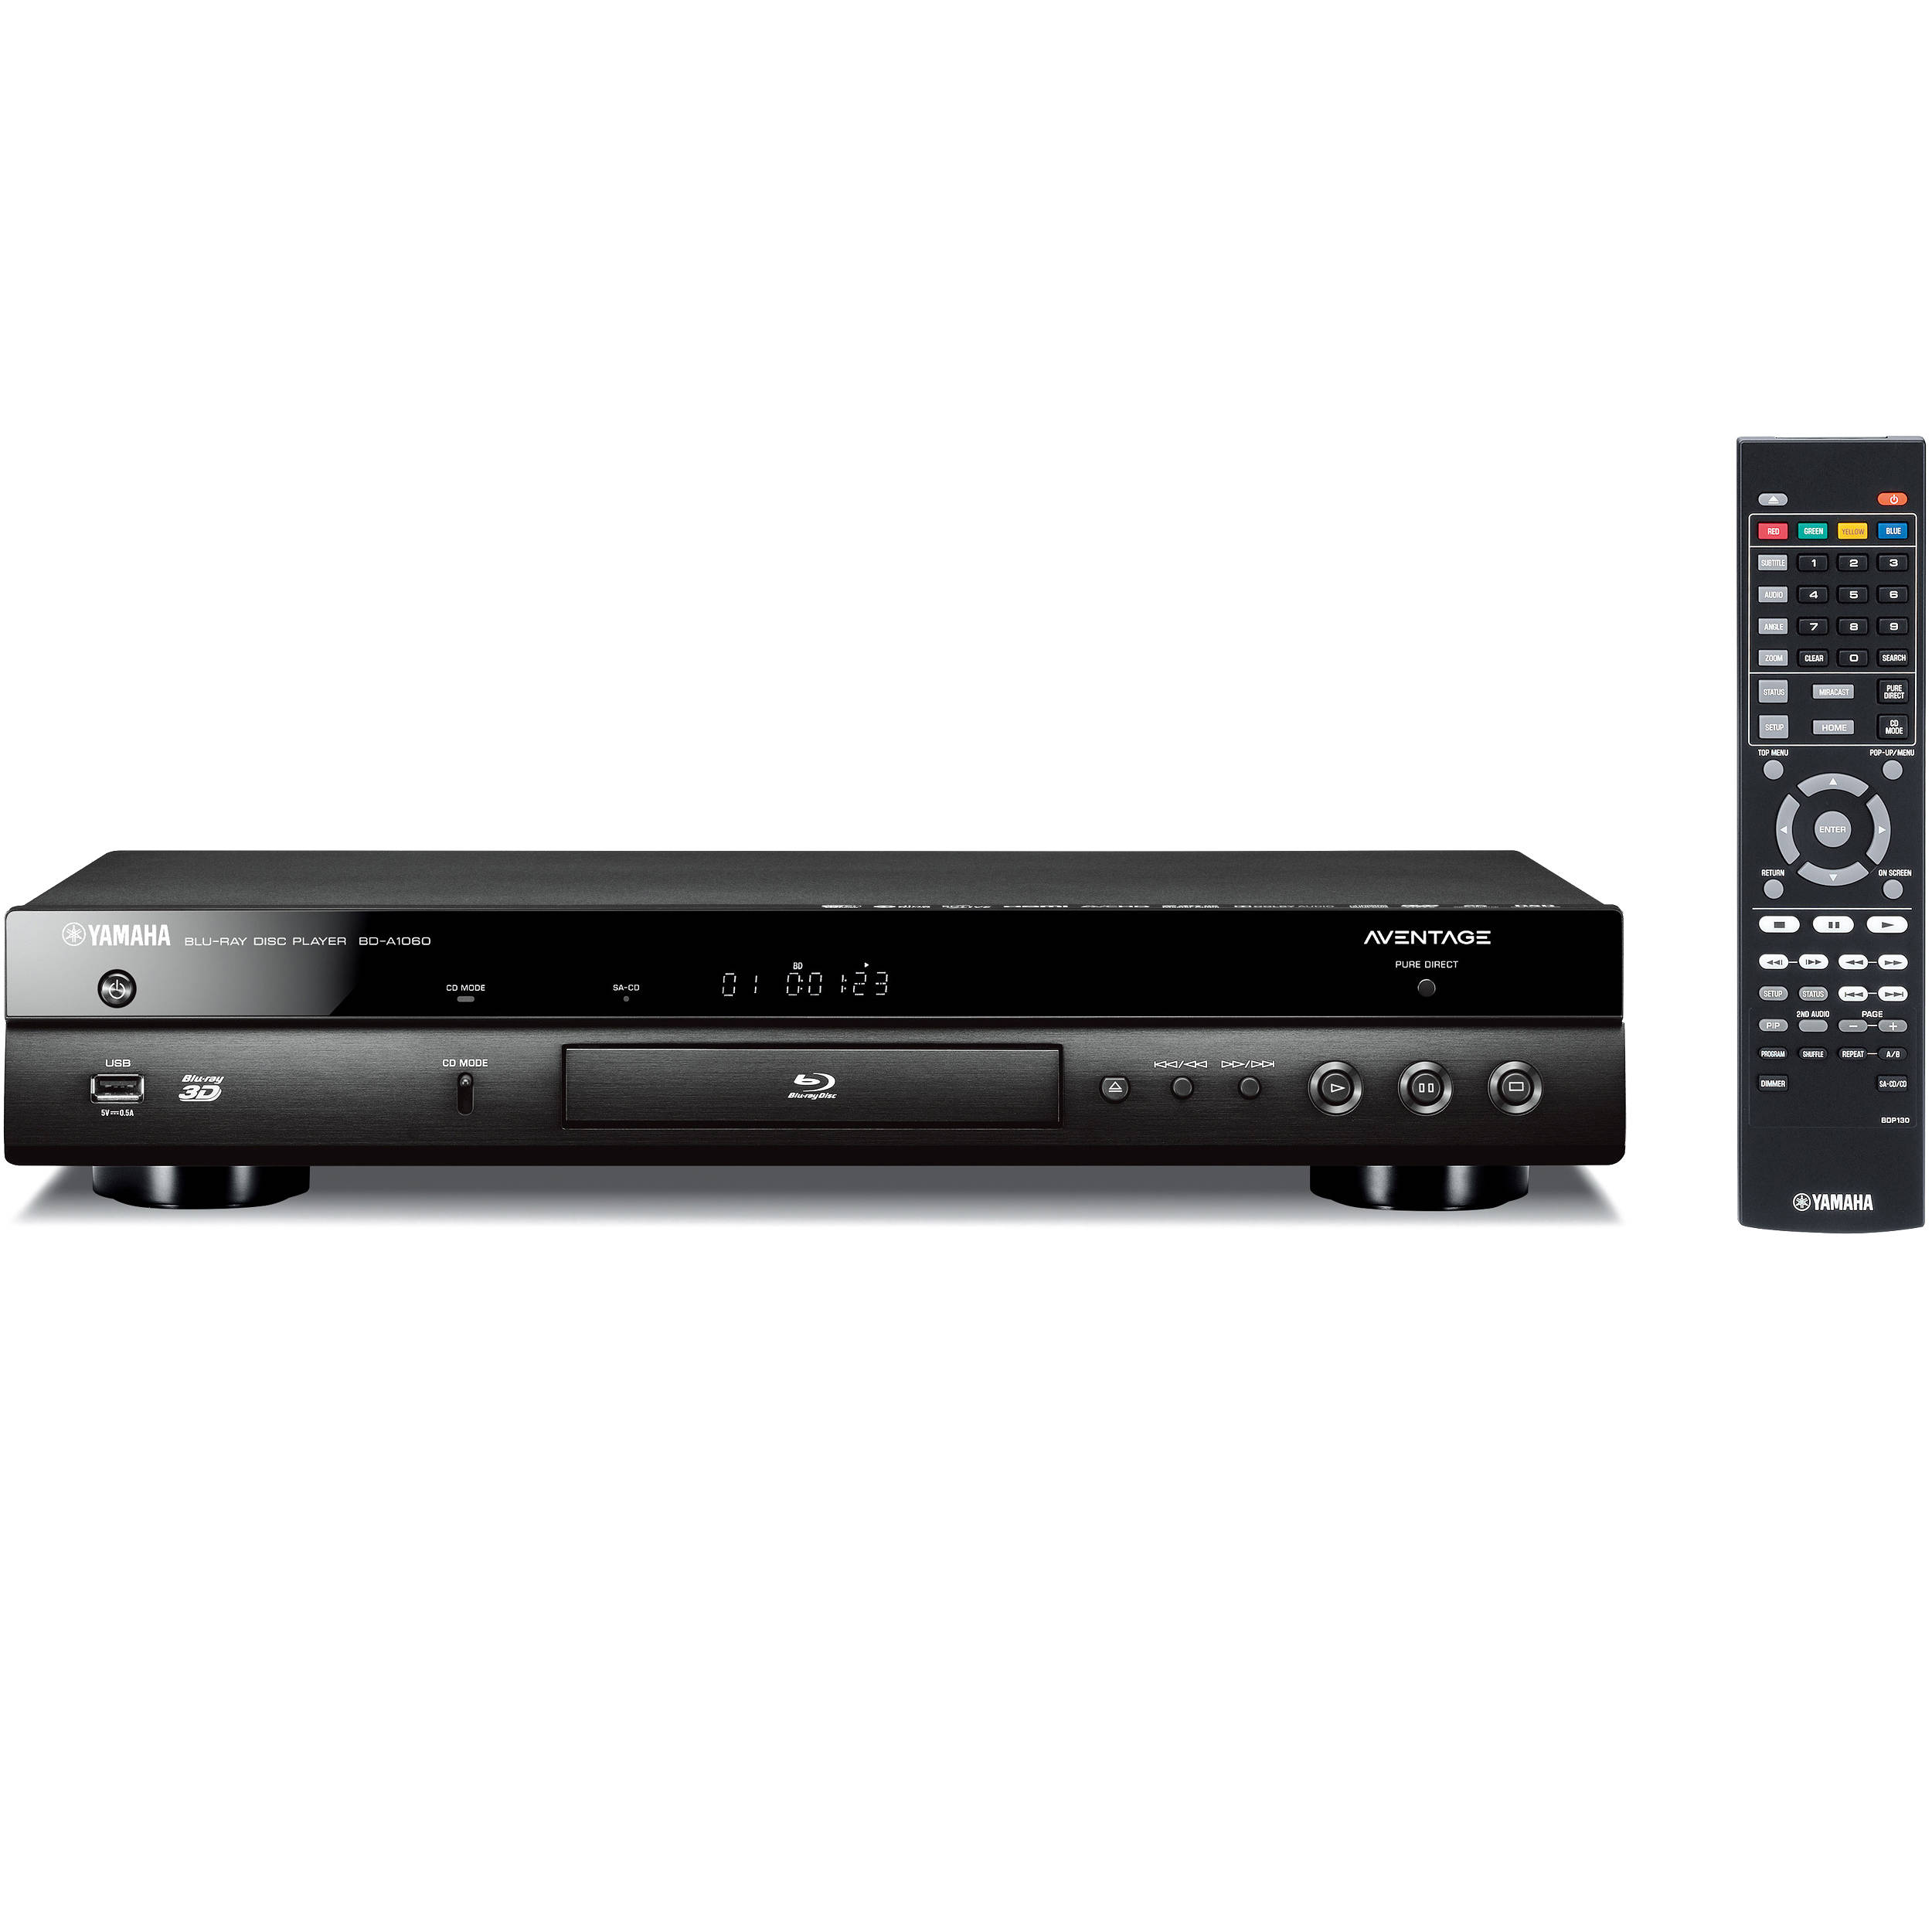 Yamaha AVENTAGE BD-A1060 4K Upscaling Wi-Fi and 3D Blu-ray Disc Player  (Black)